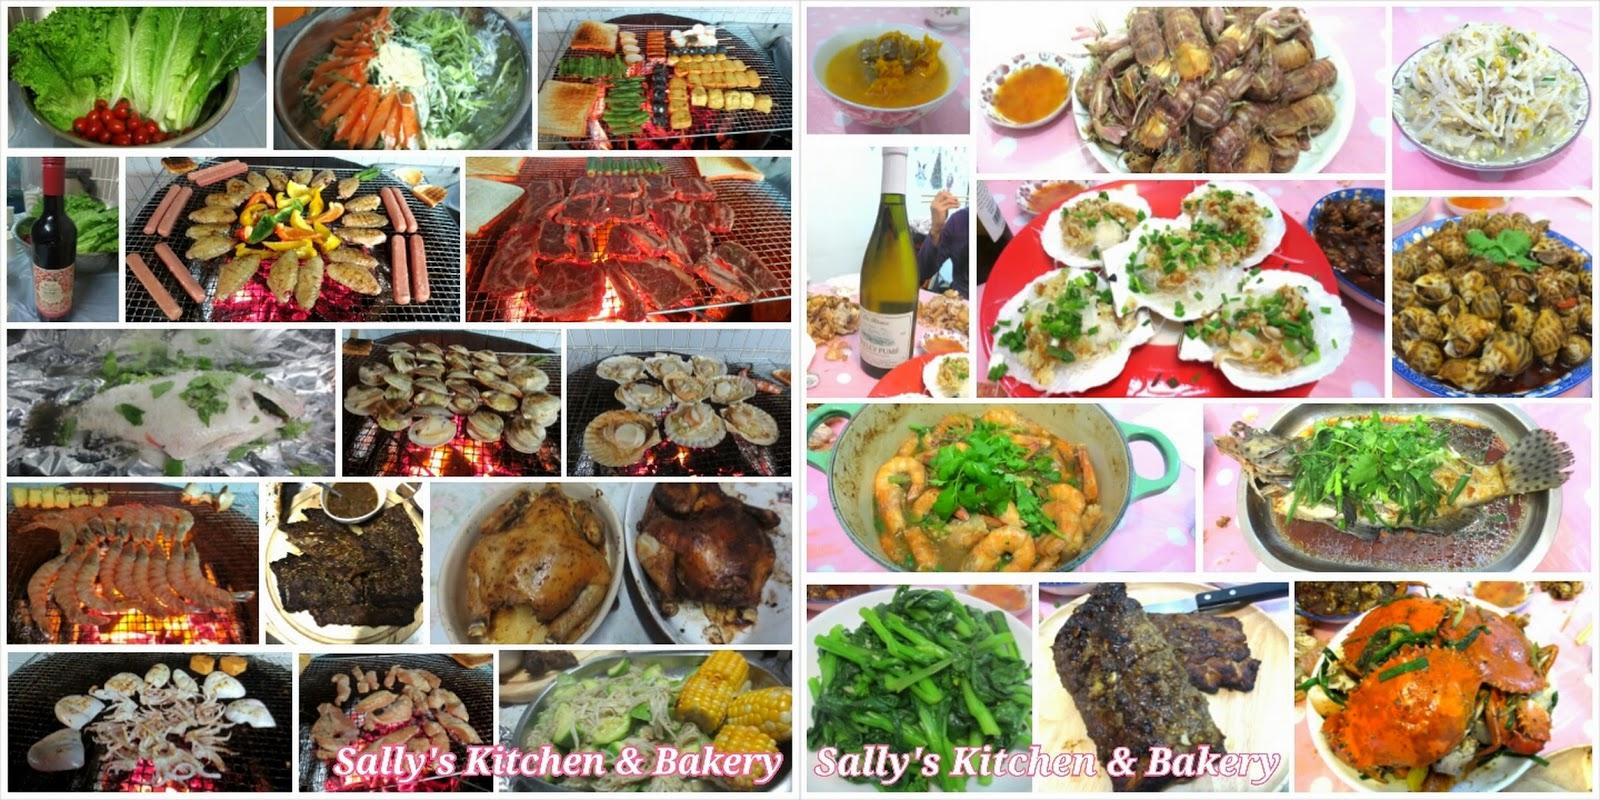 Sally's Kitchen & Bakery: 週未BBQ大派對 & 週日海鮮私房菜